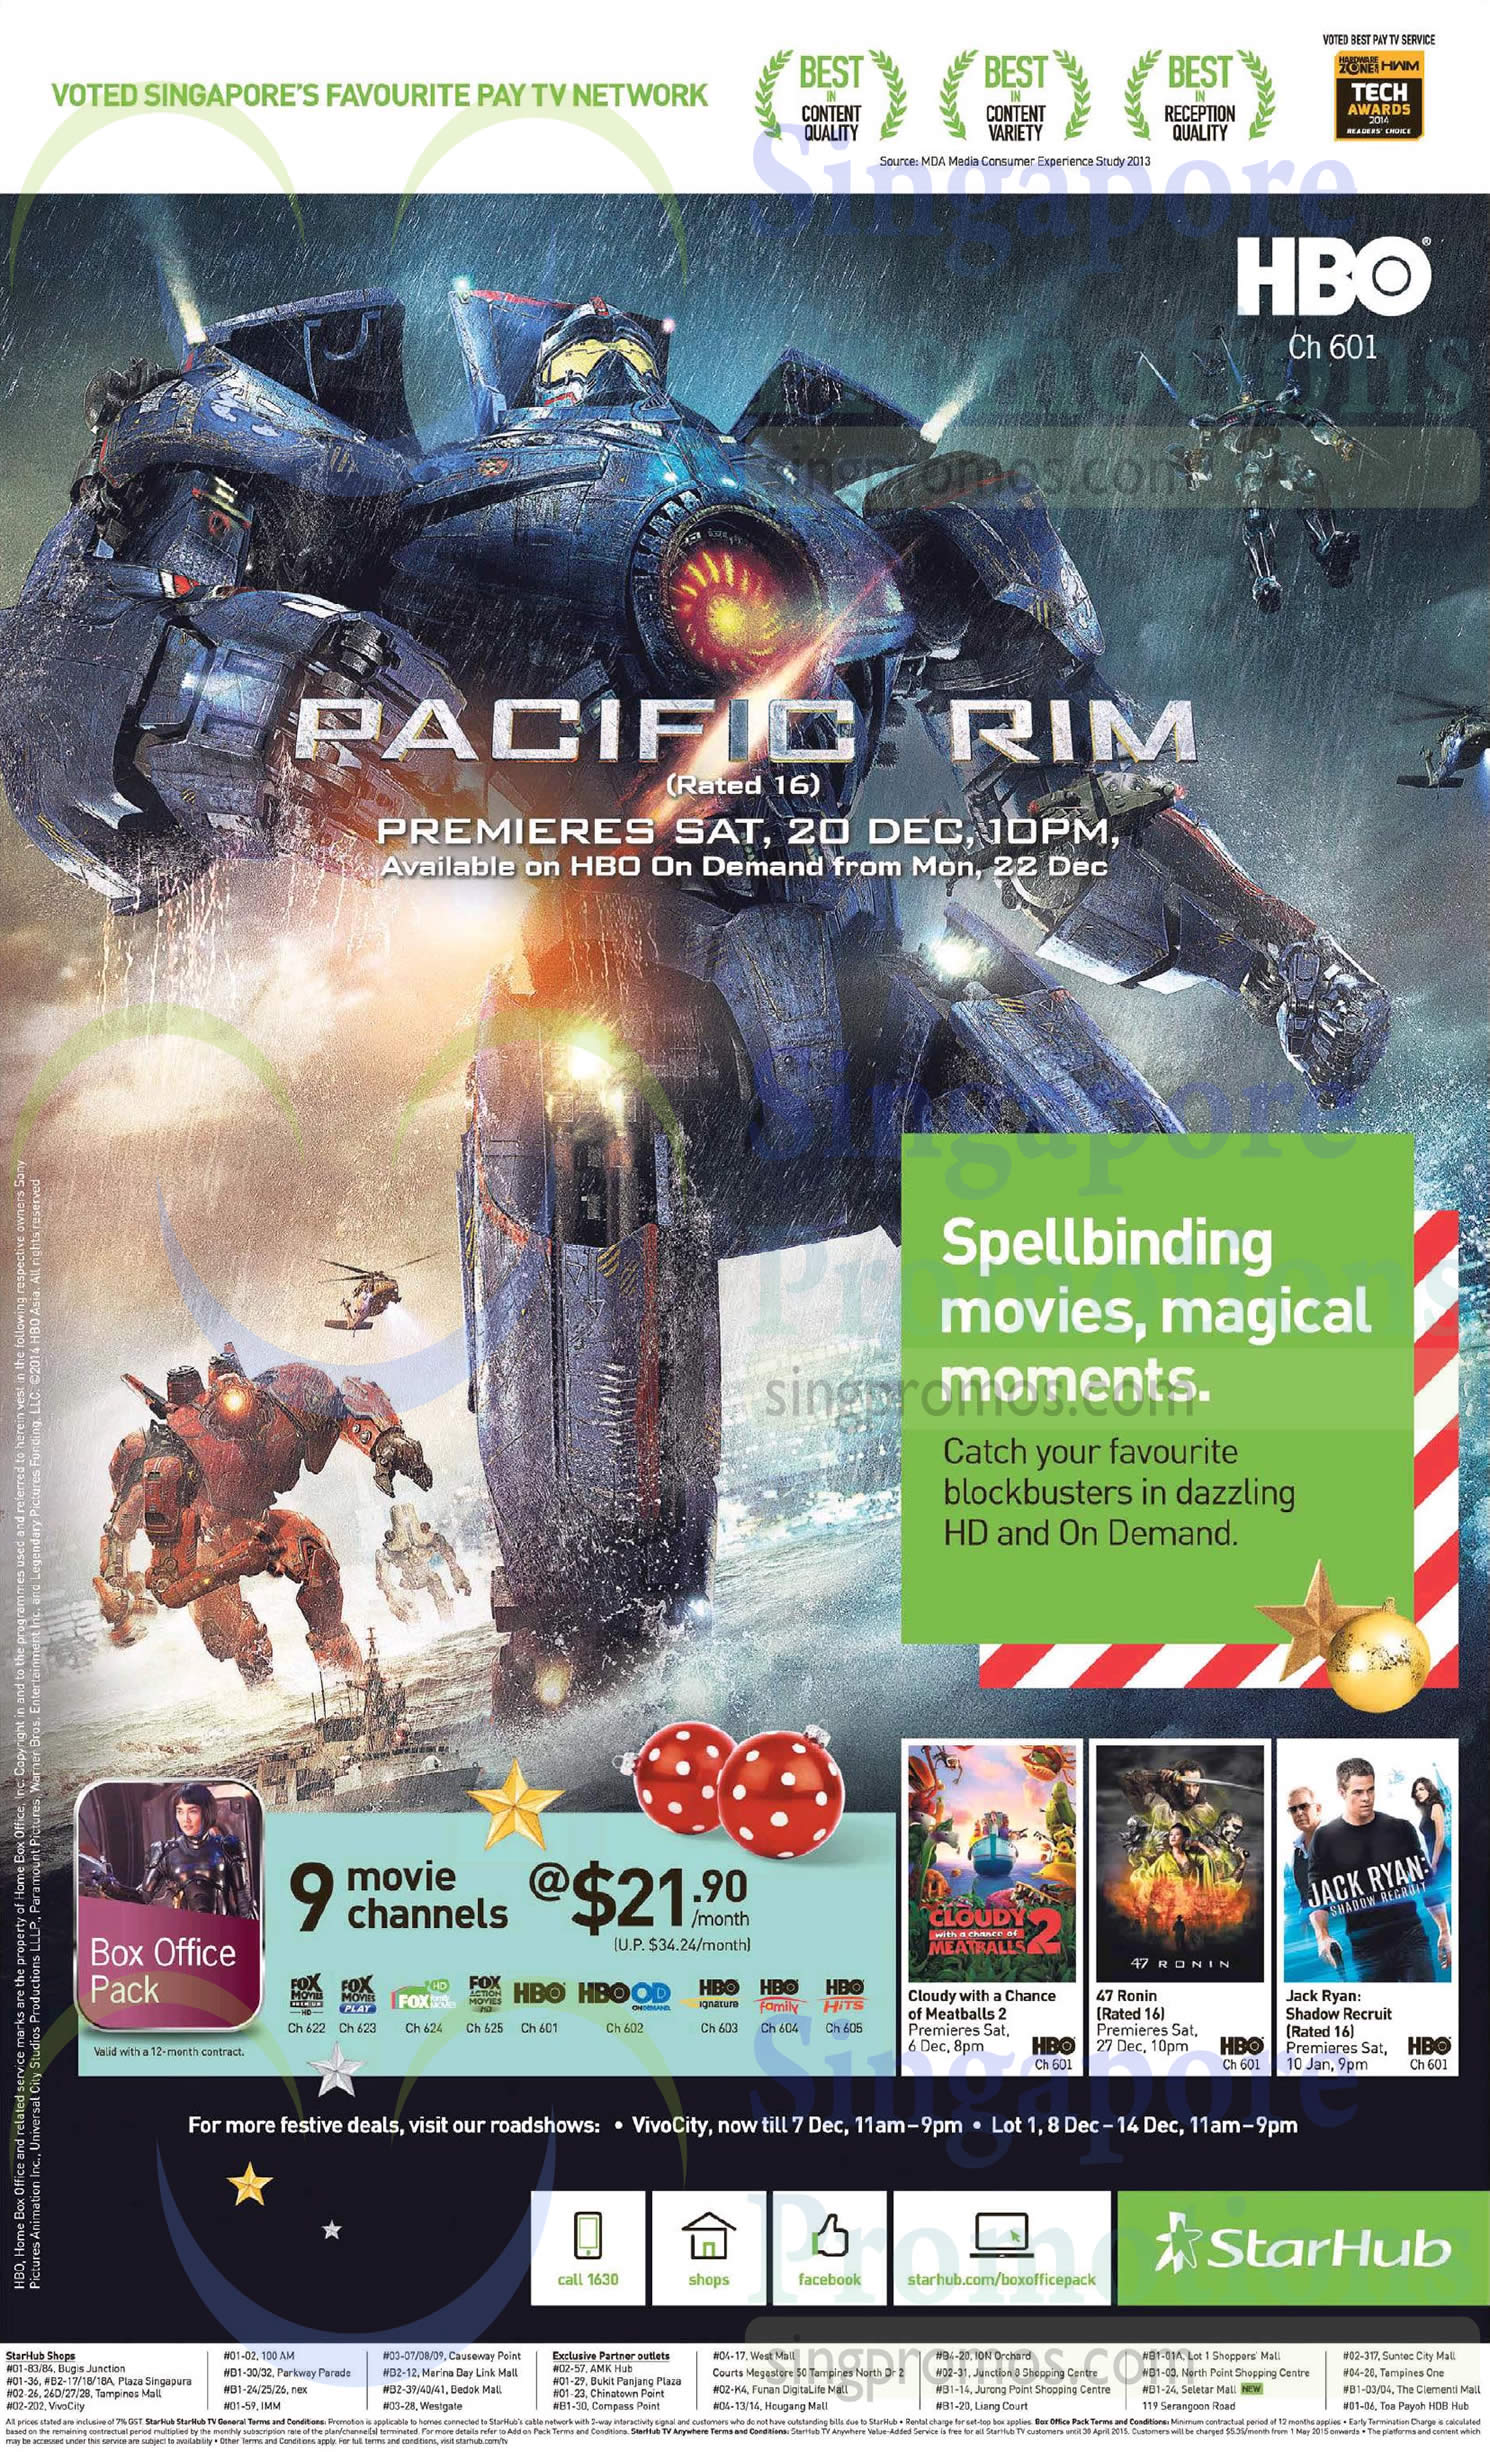 Cable TV 21.90 Box Office Pack, Vivocity, Lot 1 Roadshow